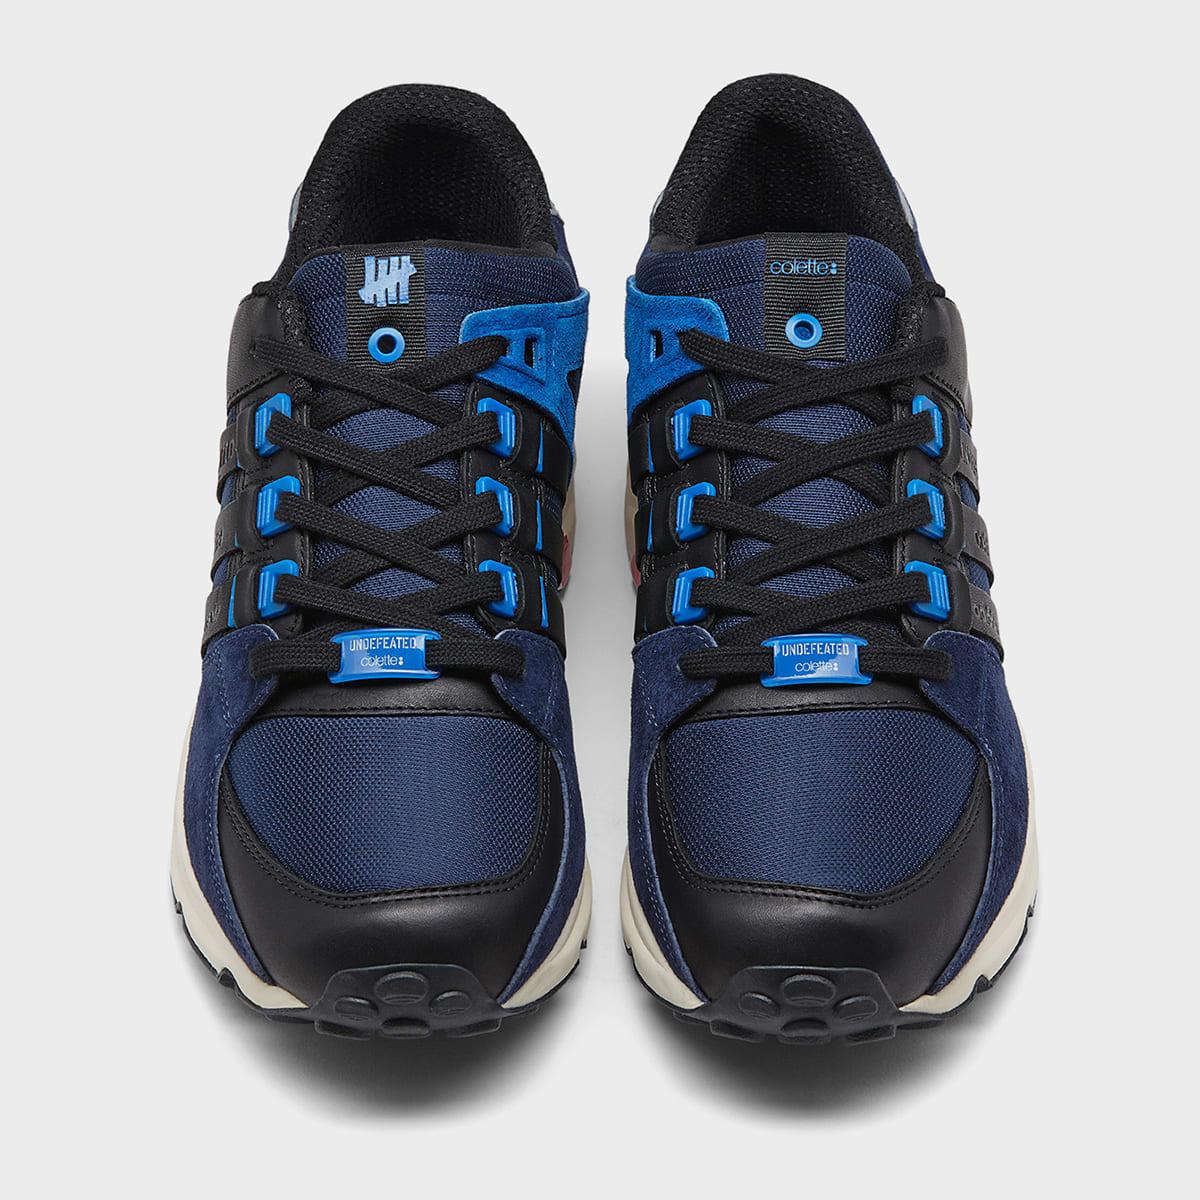 new concept 053d5 e6f31 Adidas Consortium x Colette x UNDFTD EQT Support S.E.